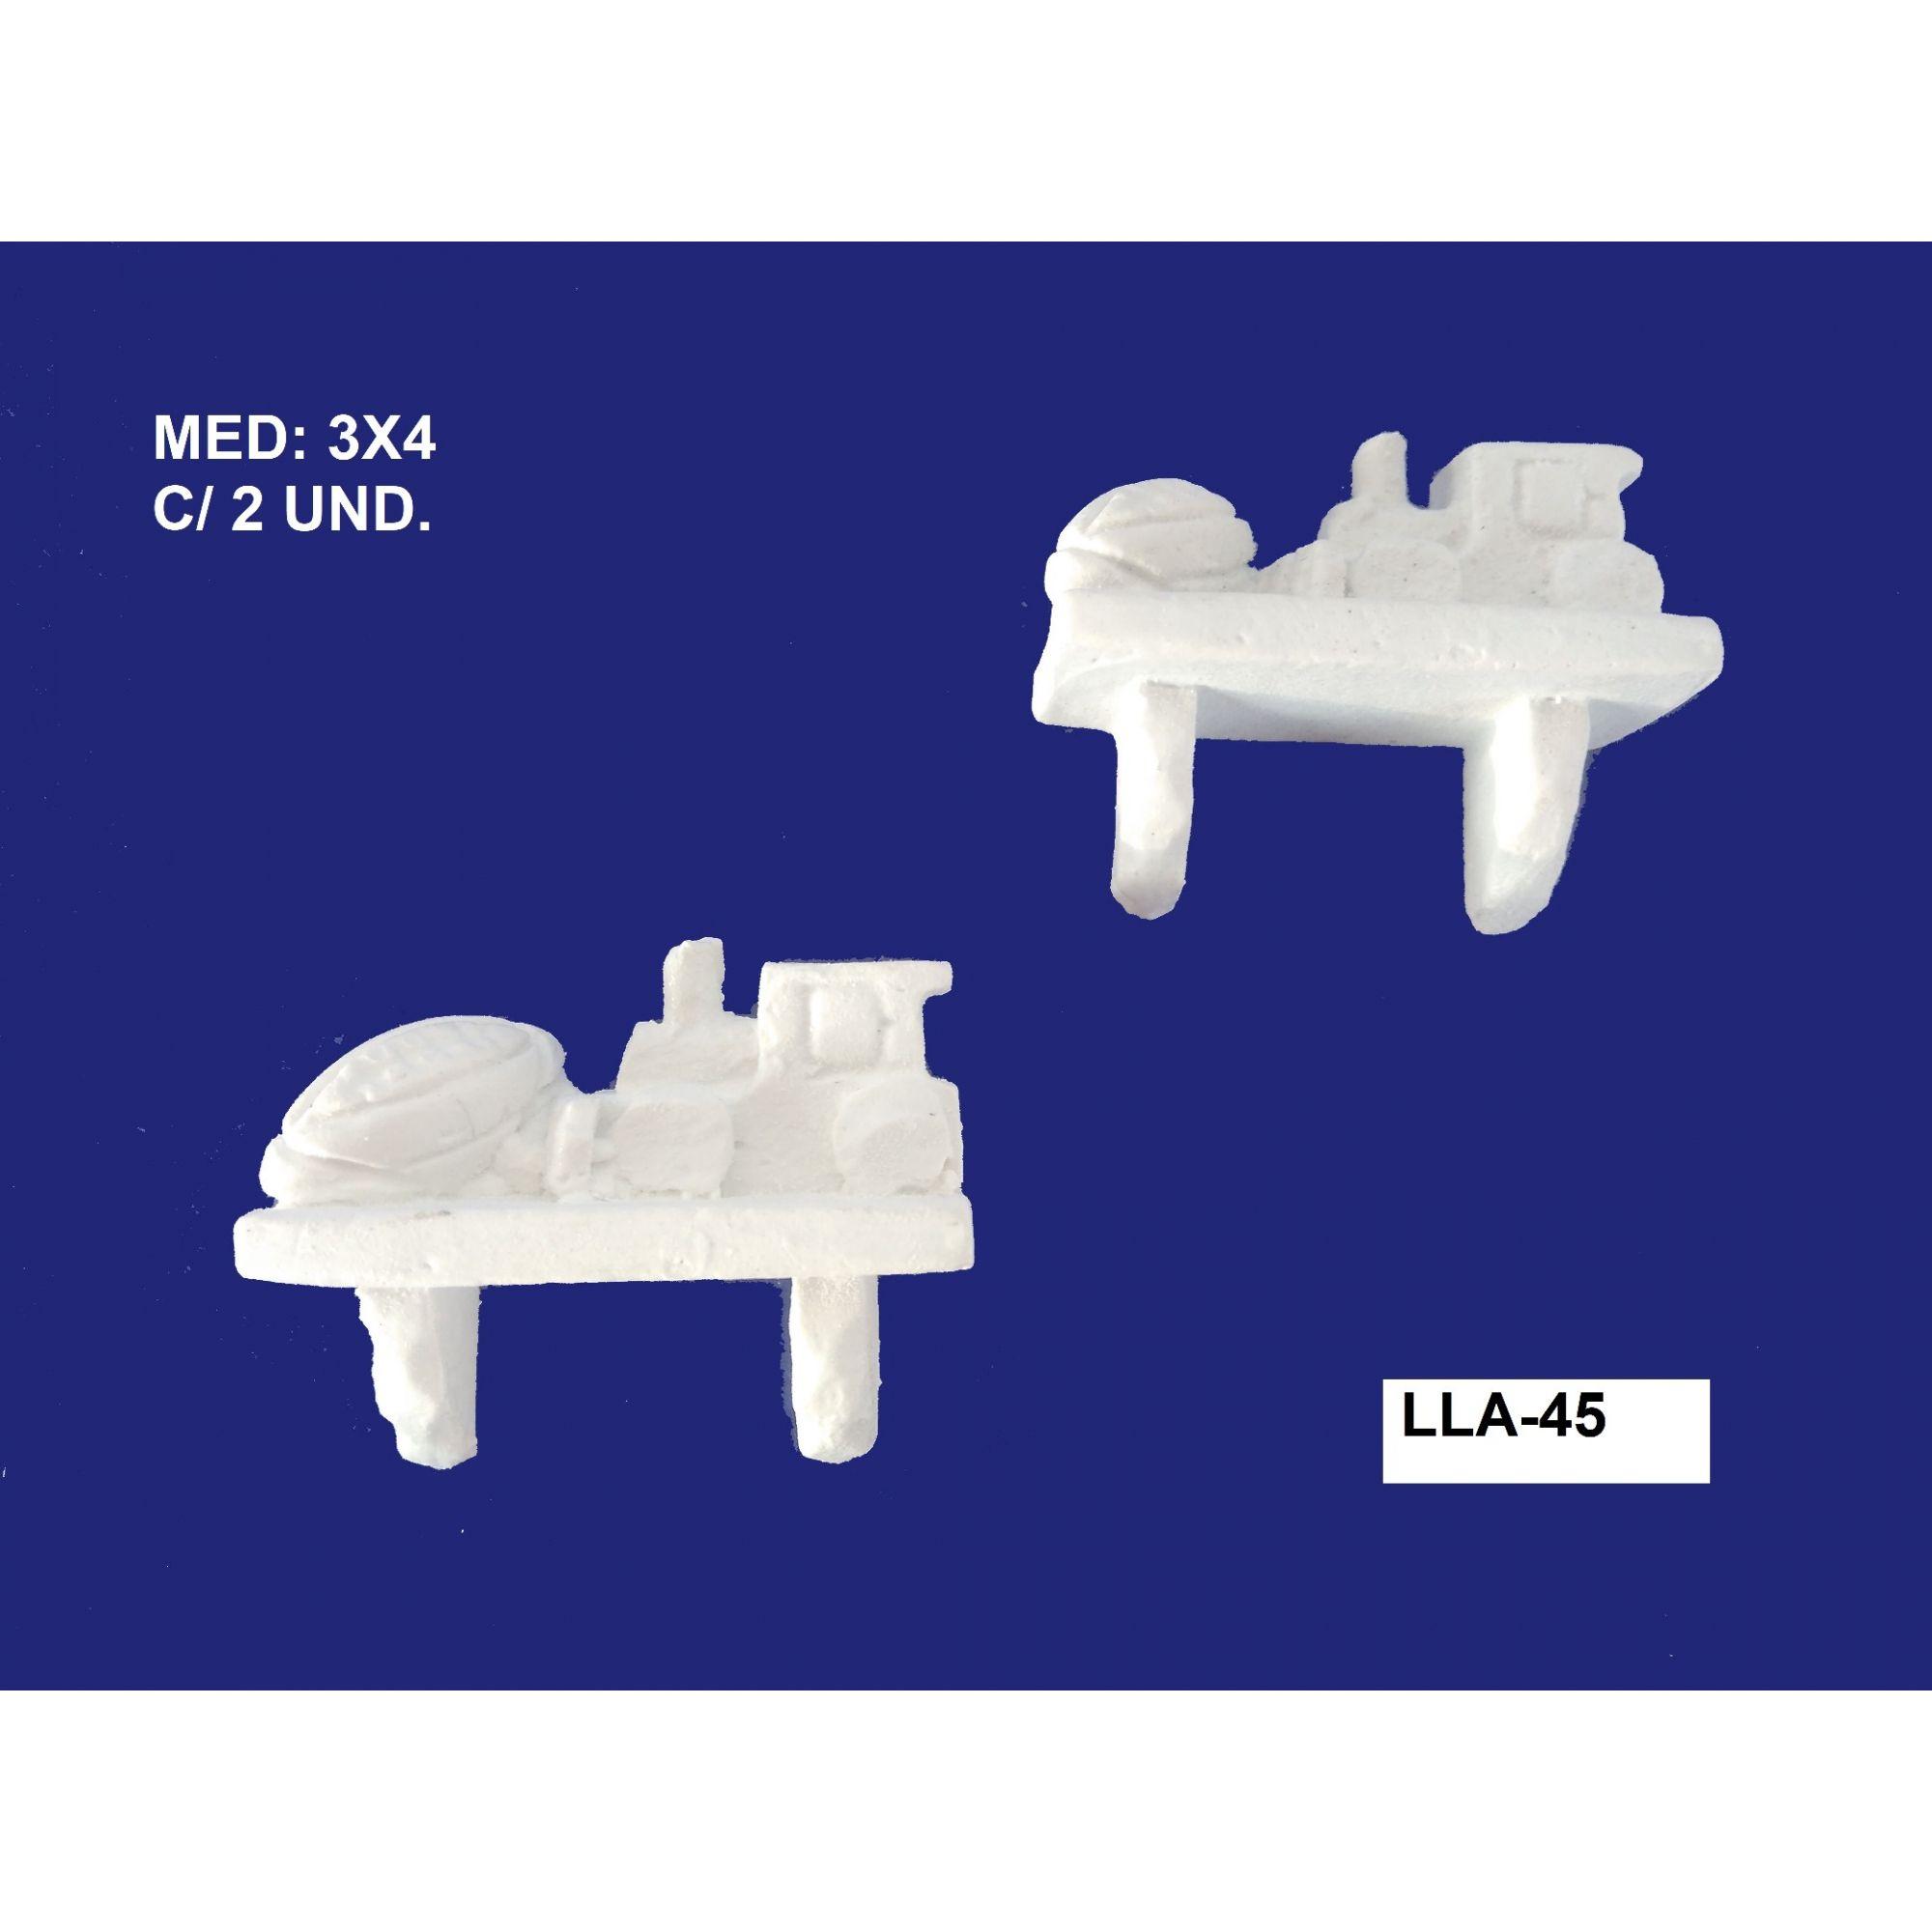 LLA-45 APLIQUE PRATELEIRA 03X04CM C/ 2 UND.